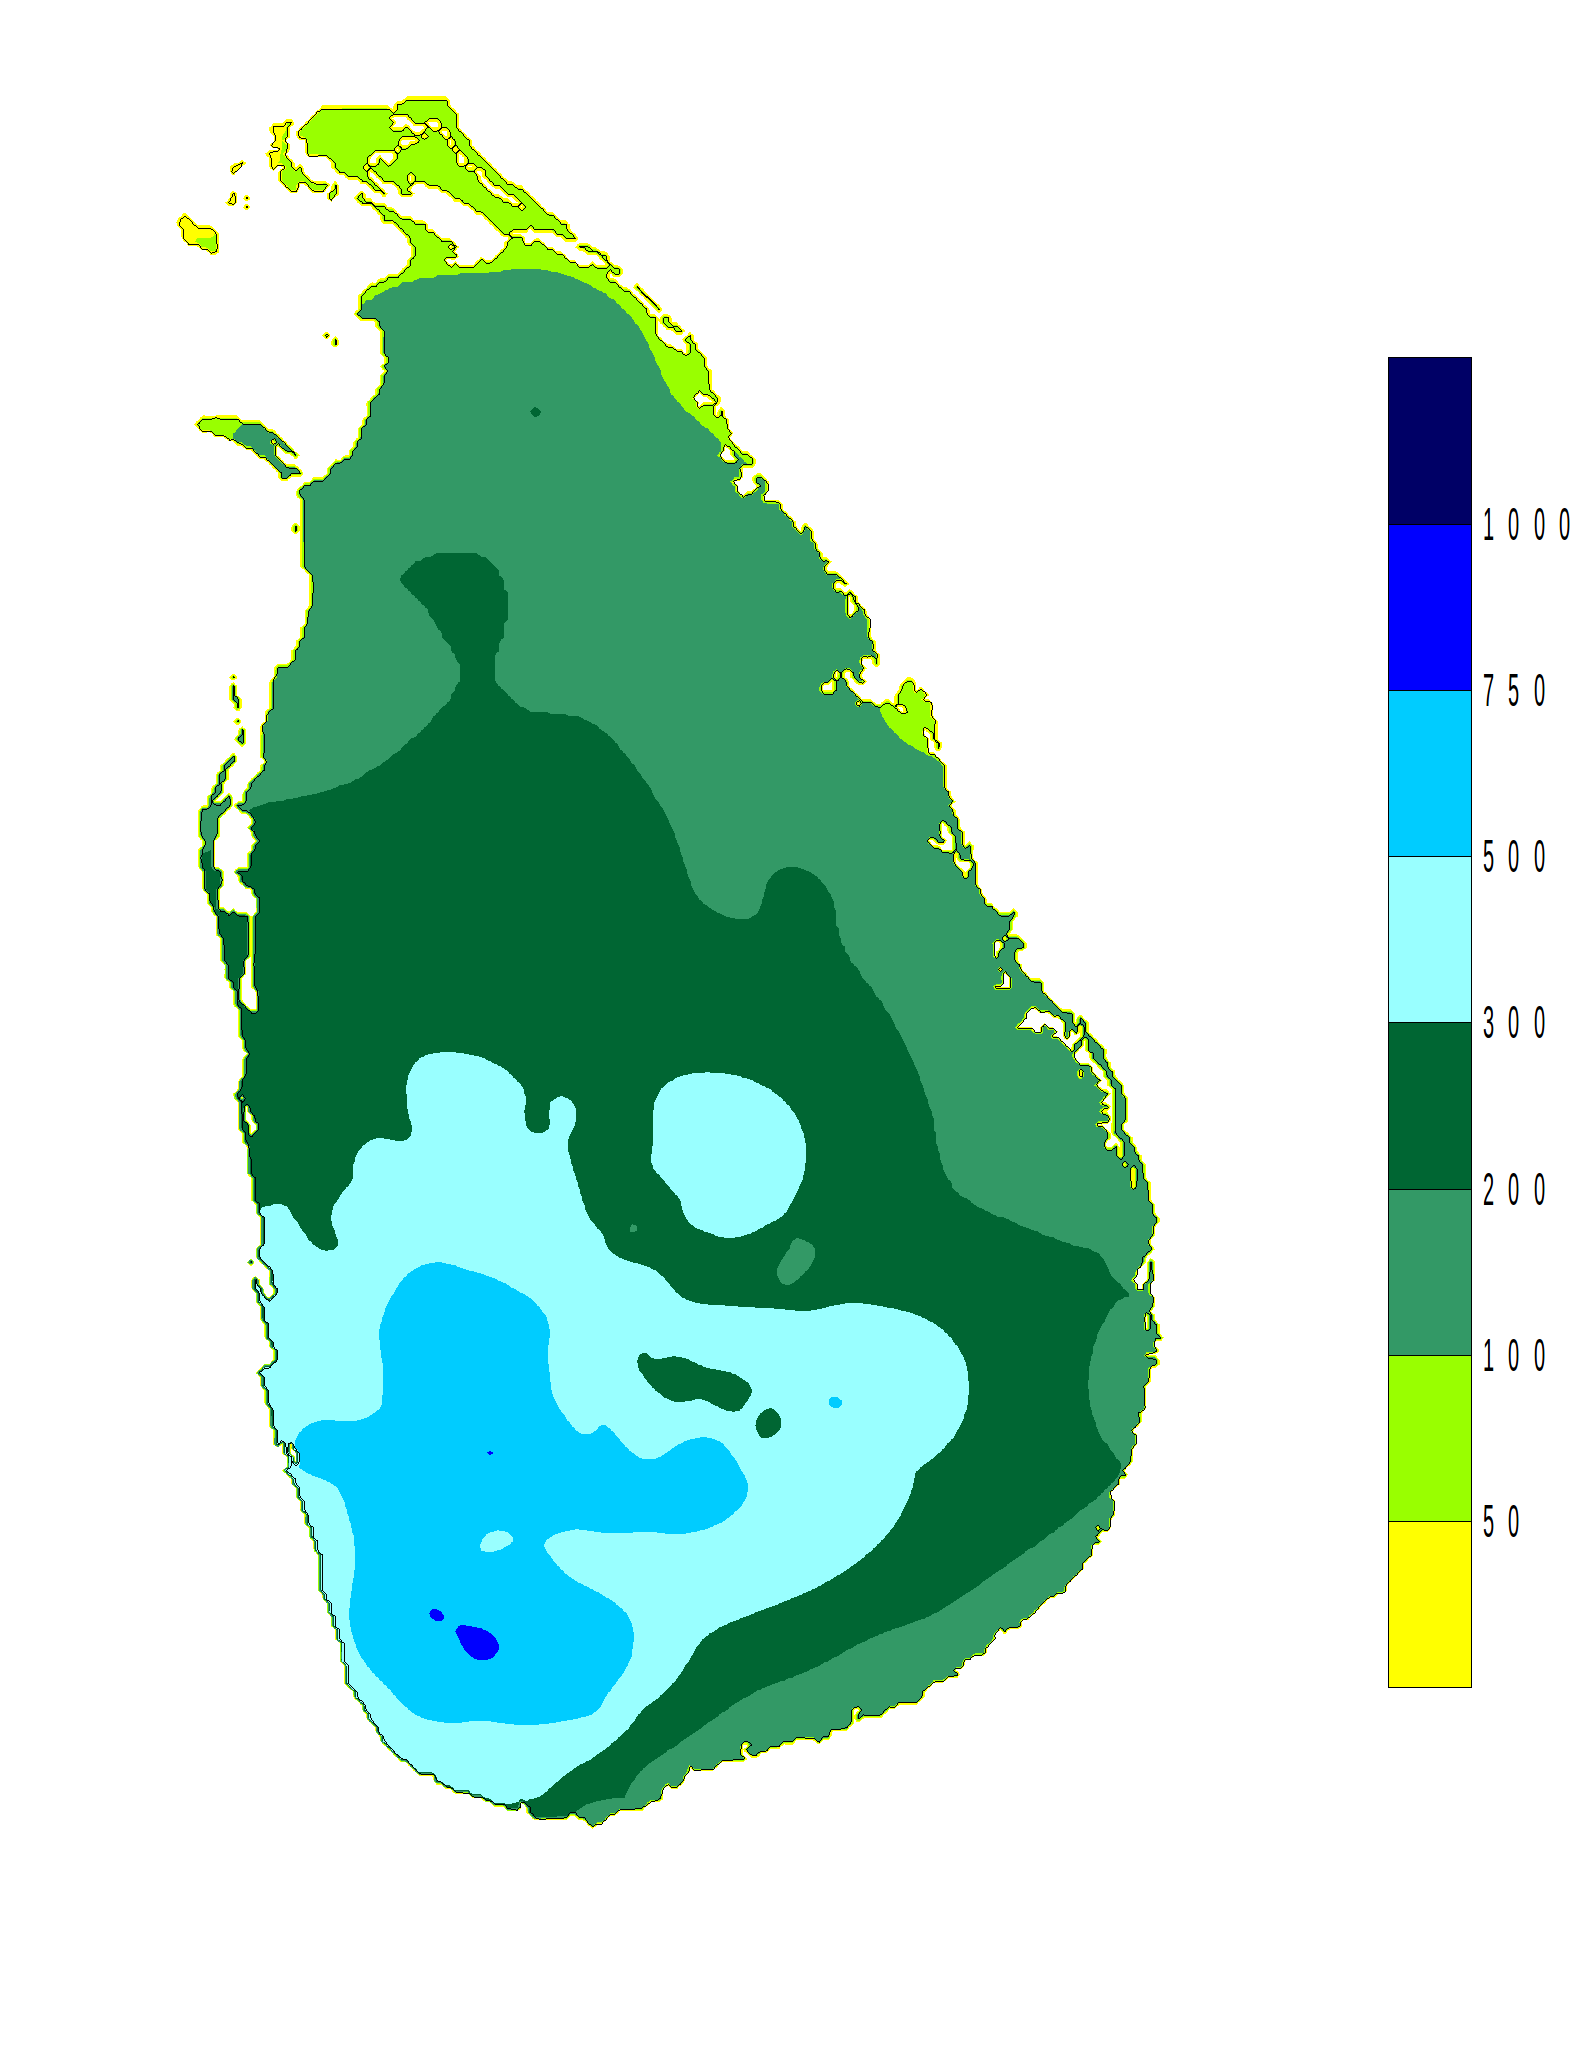 1st inter-monsoonal (Mar-Apr)